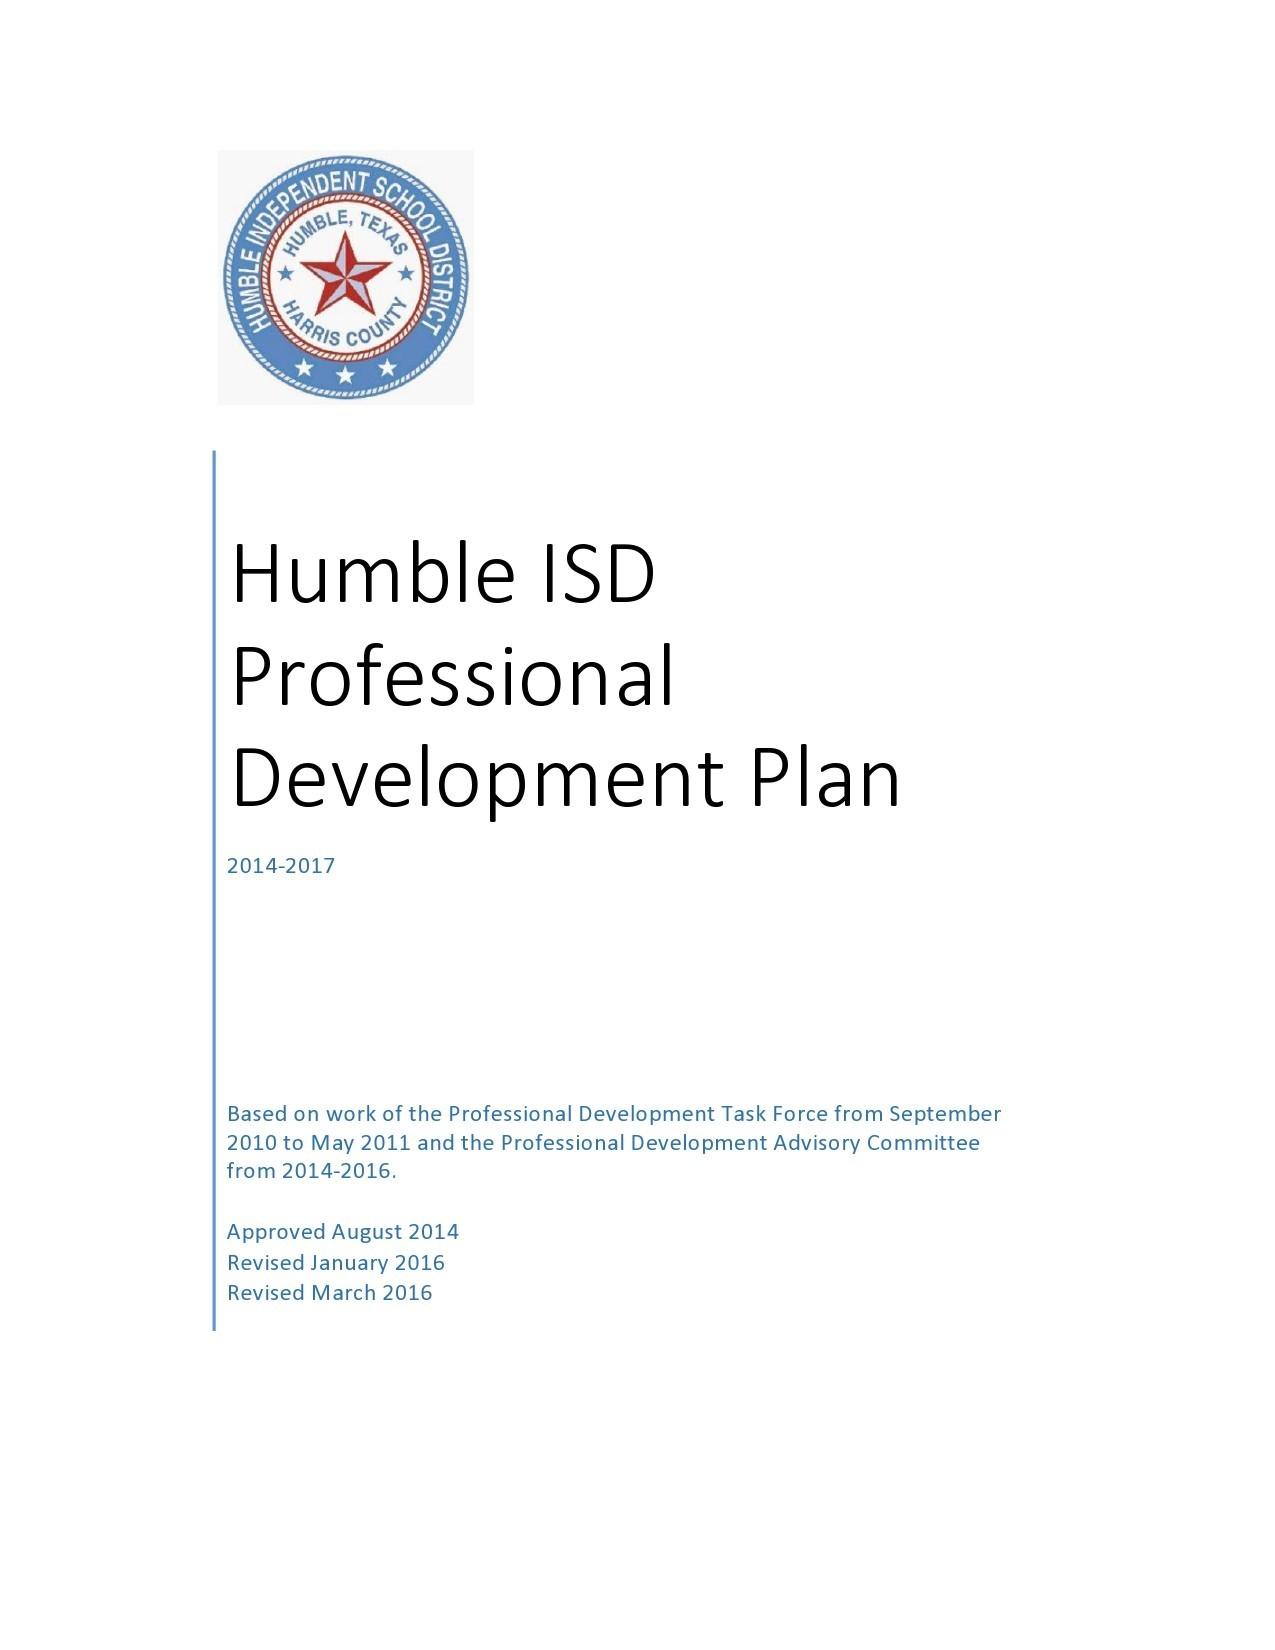 Free professional development plan 44